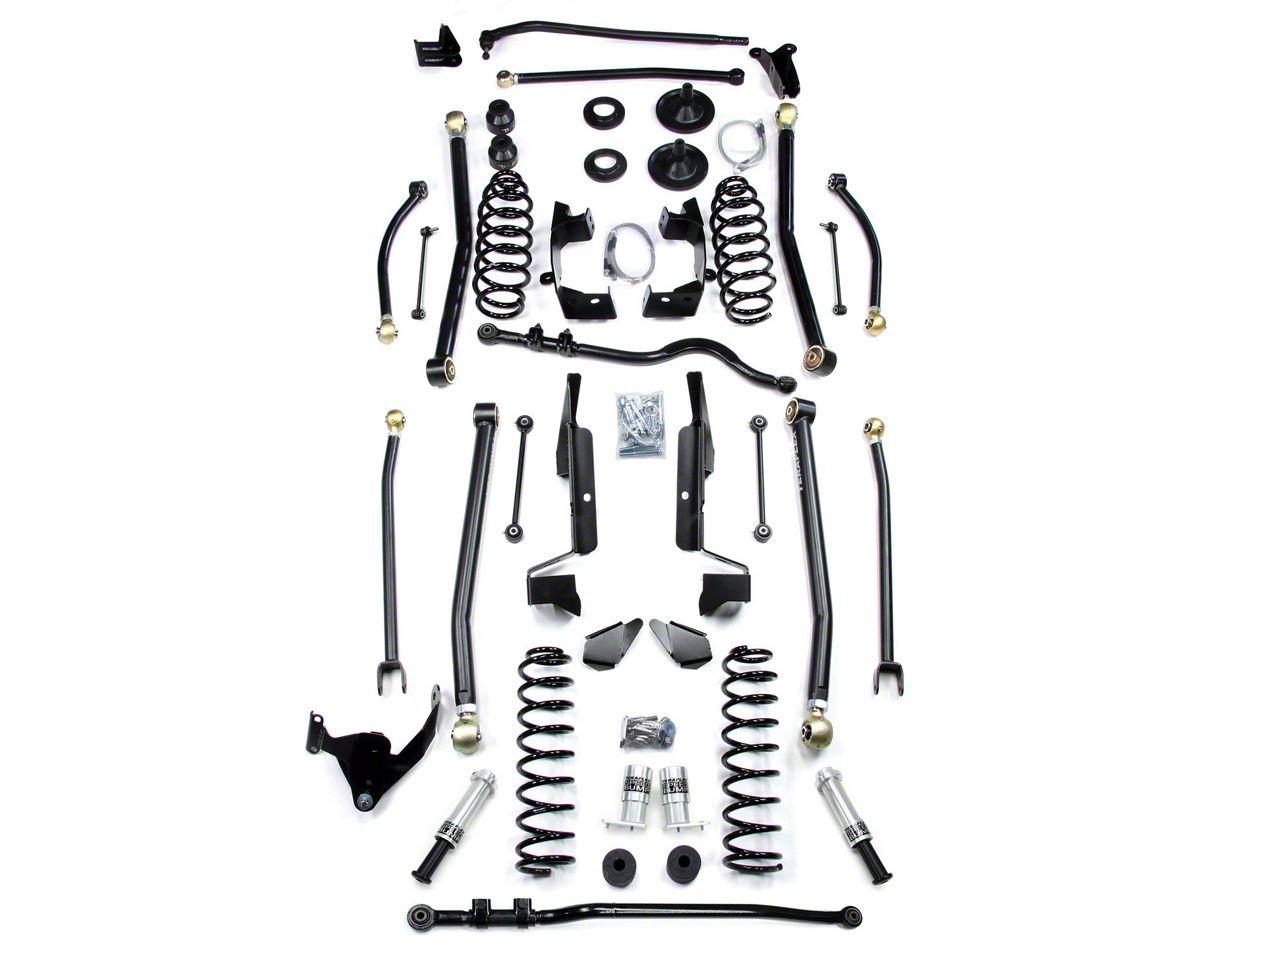 Teraflex 6 in. Elite LCG Long FlexArm Lift Kit w/ SpeedBumps (07-18 Jeep Wrangler JK 4 Door)